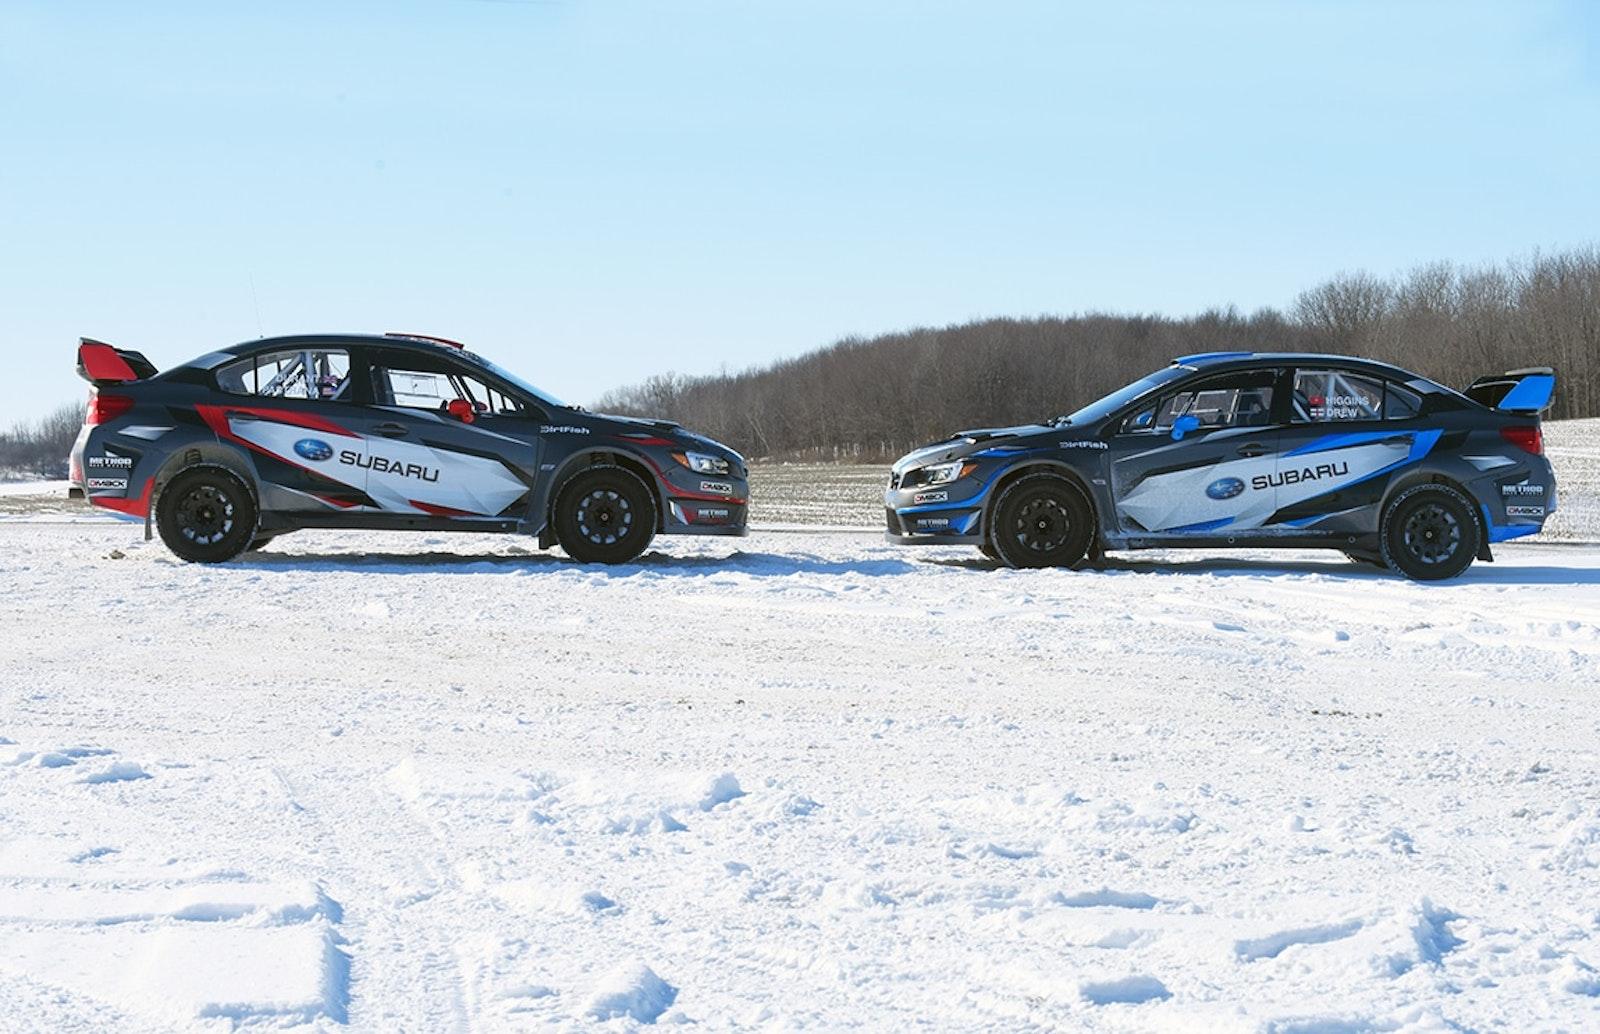 The_199_and_75_Subaru_WRX_STI_rally_cars_of_Pastrana_and_Higgins